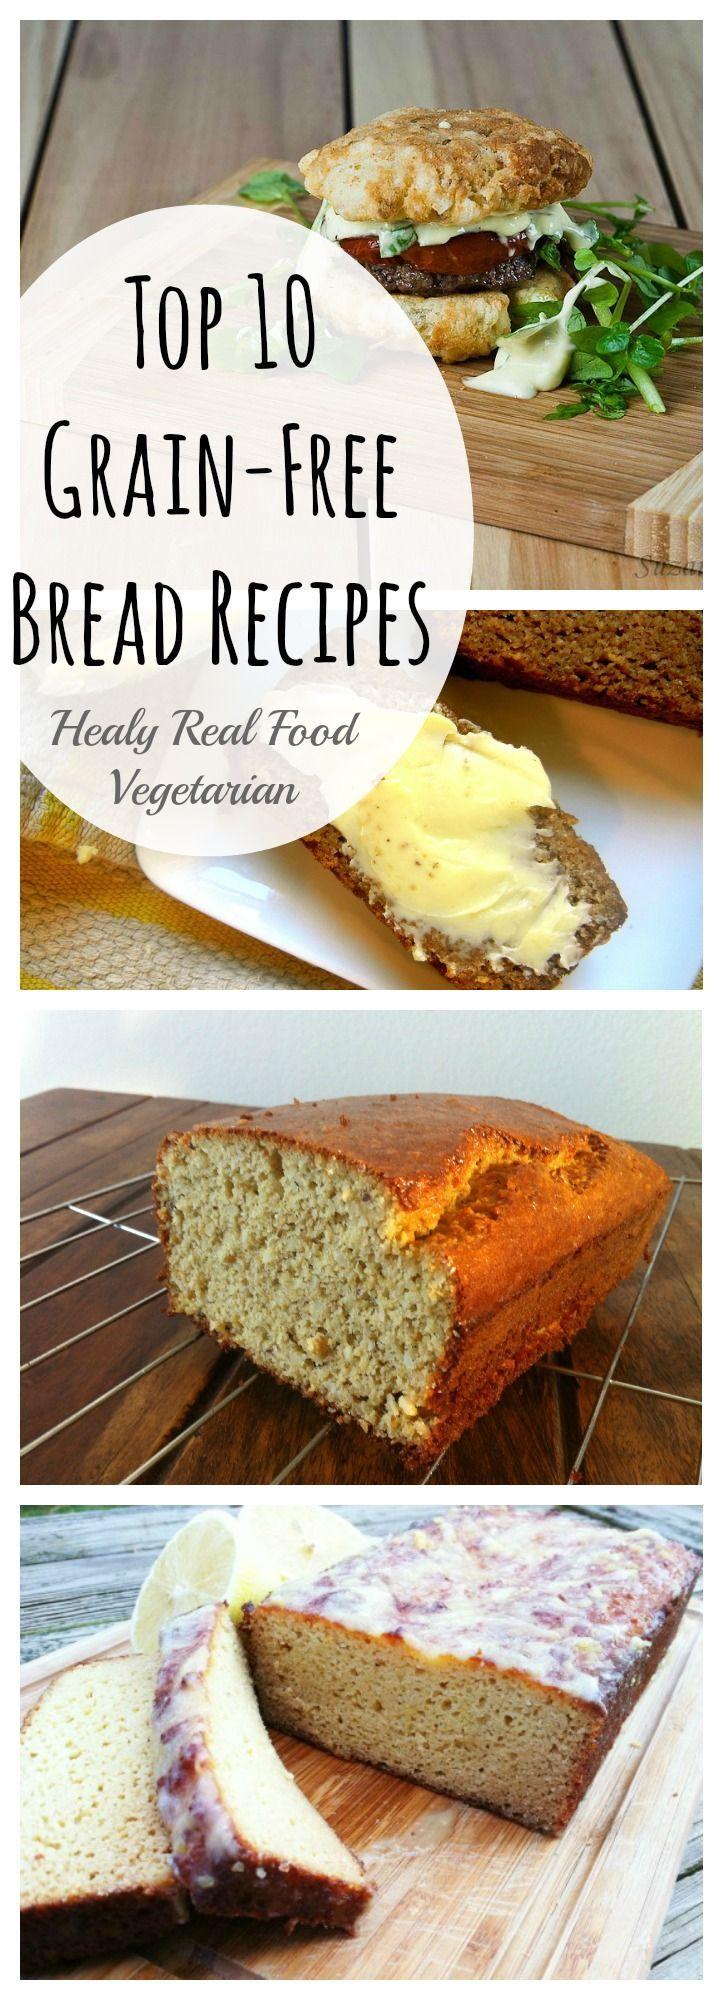 Top 12 Grain Free Bread Recipes That REALLY Taste Like